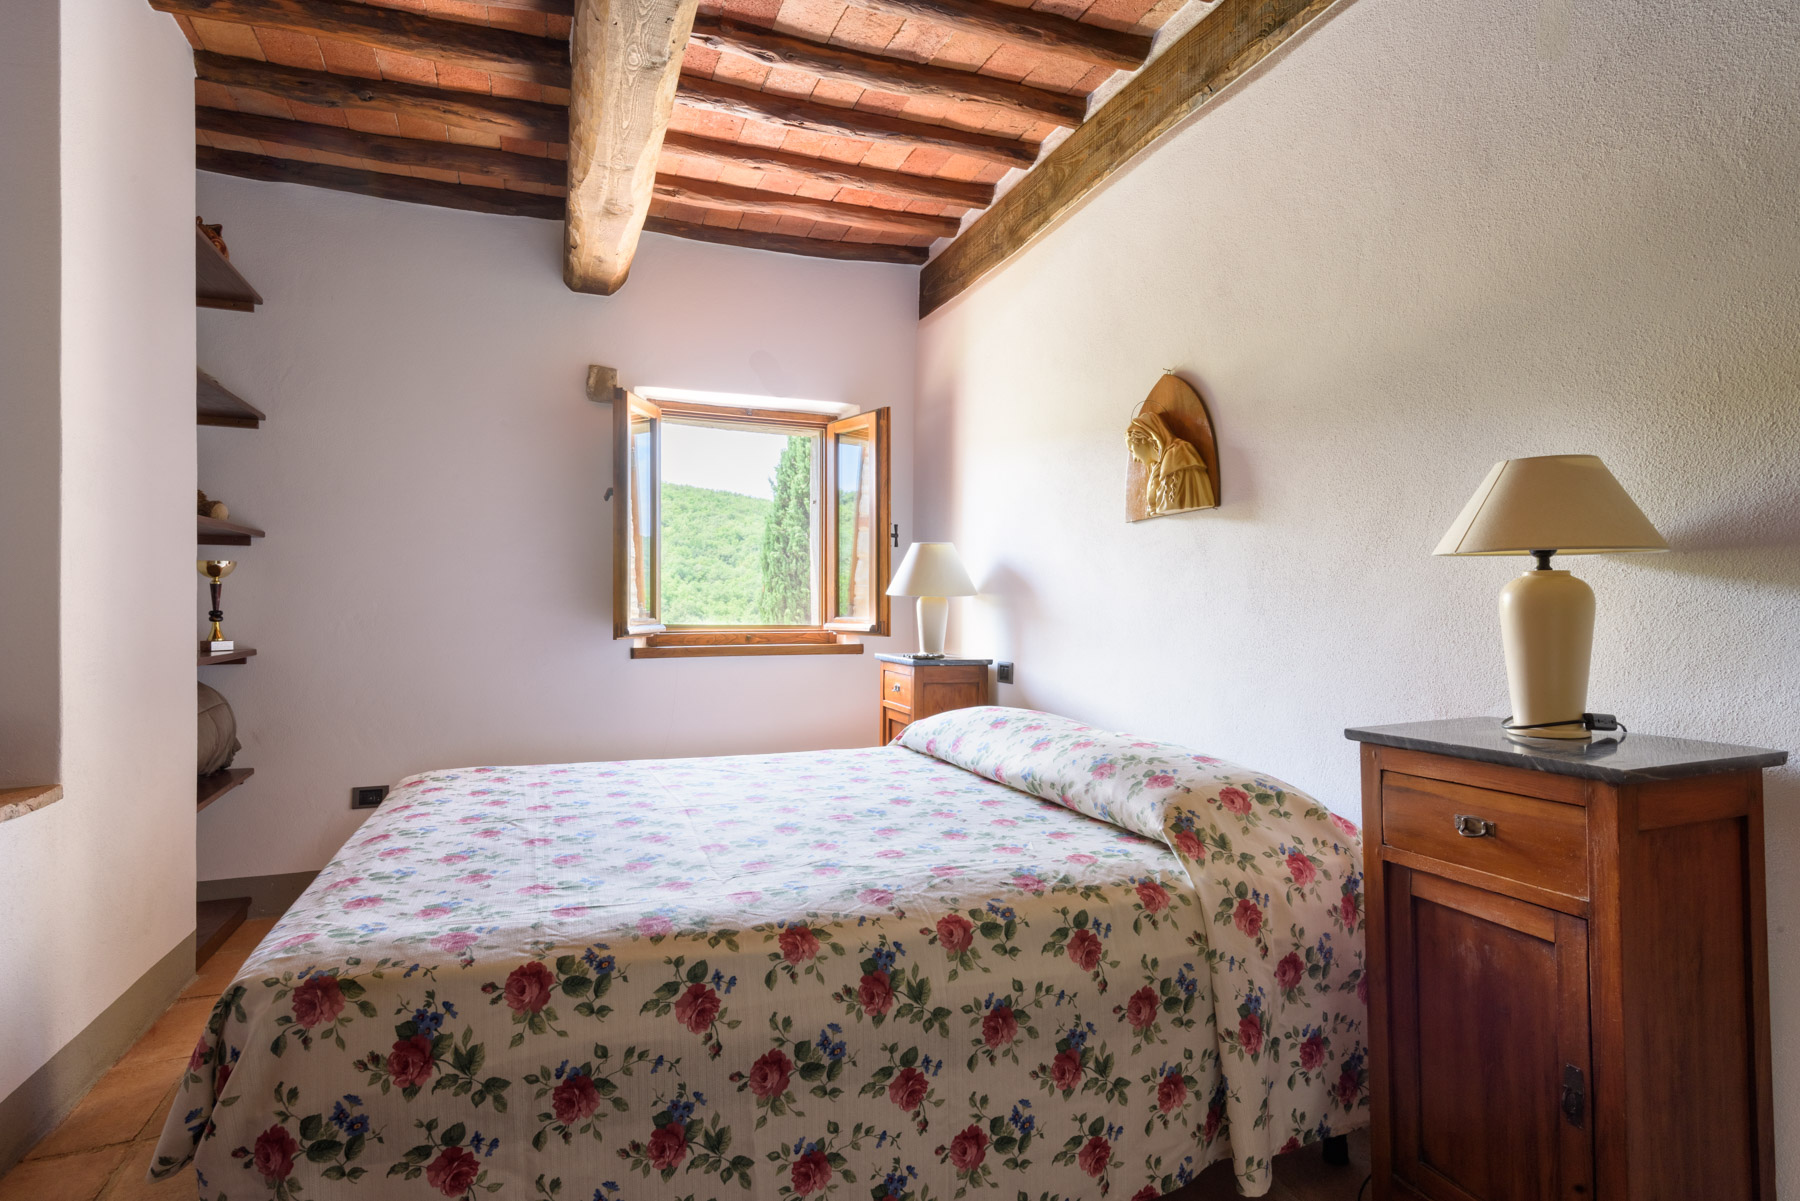 Rustico in Vendita a Castellina In Chianti: 5 locali, 650 mq - Foto 17